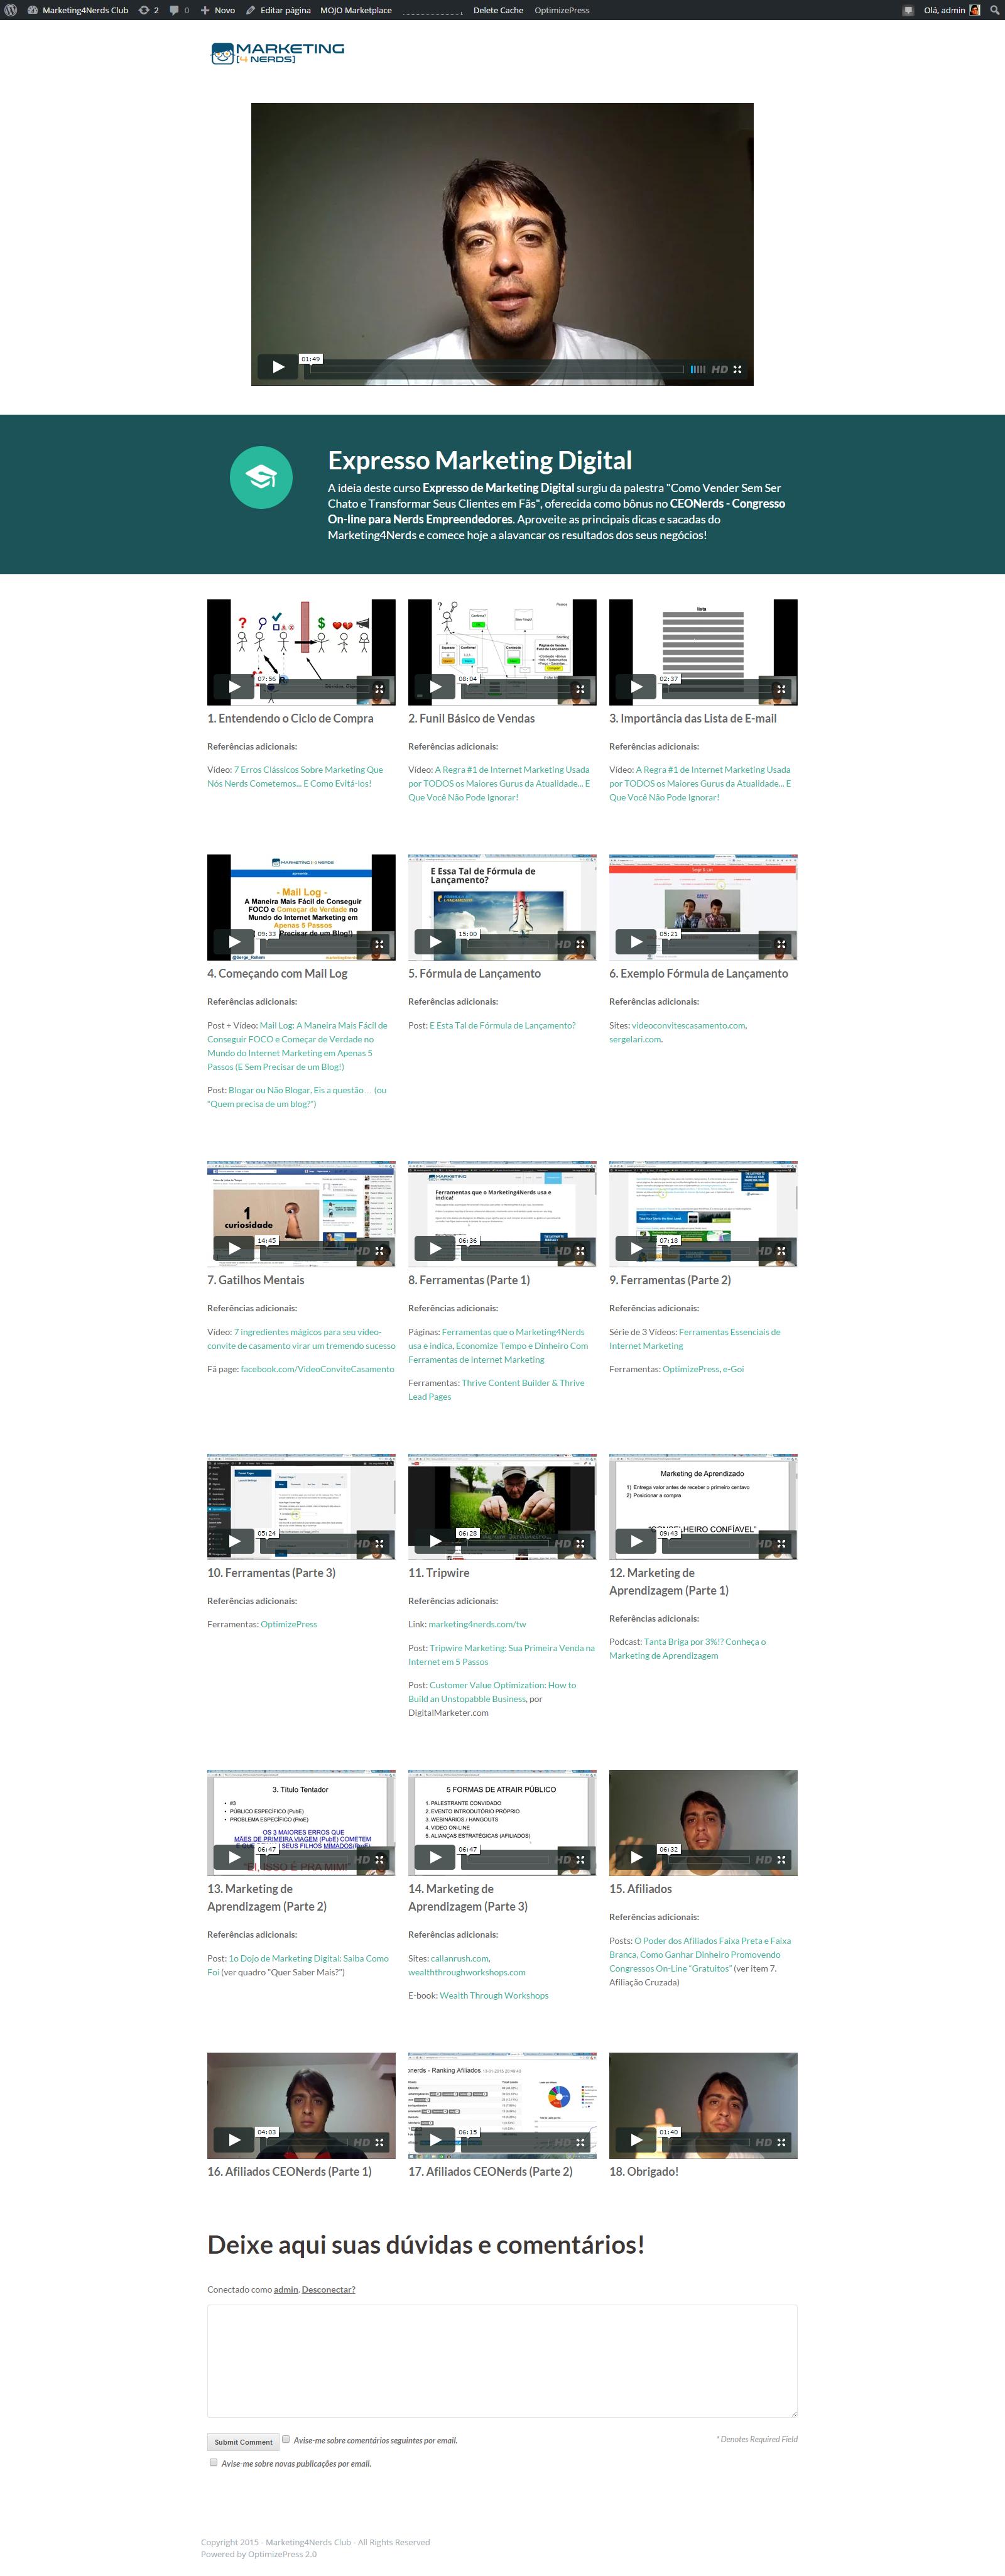 curso-expresso-marketing-digital-marketing4nerds